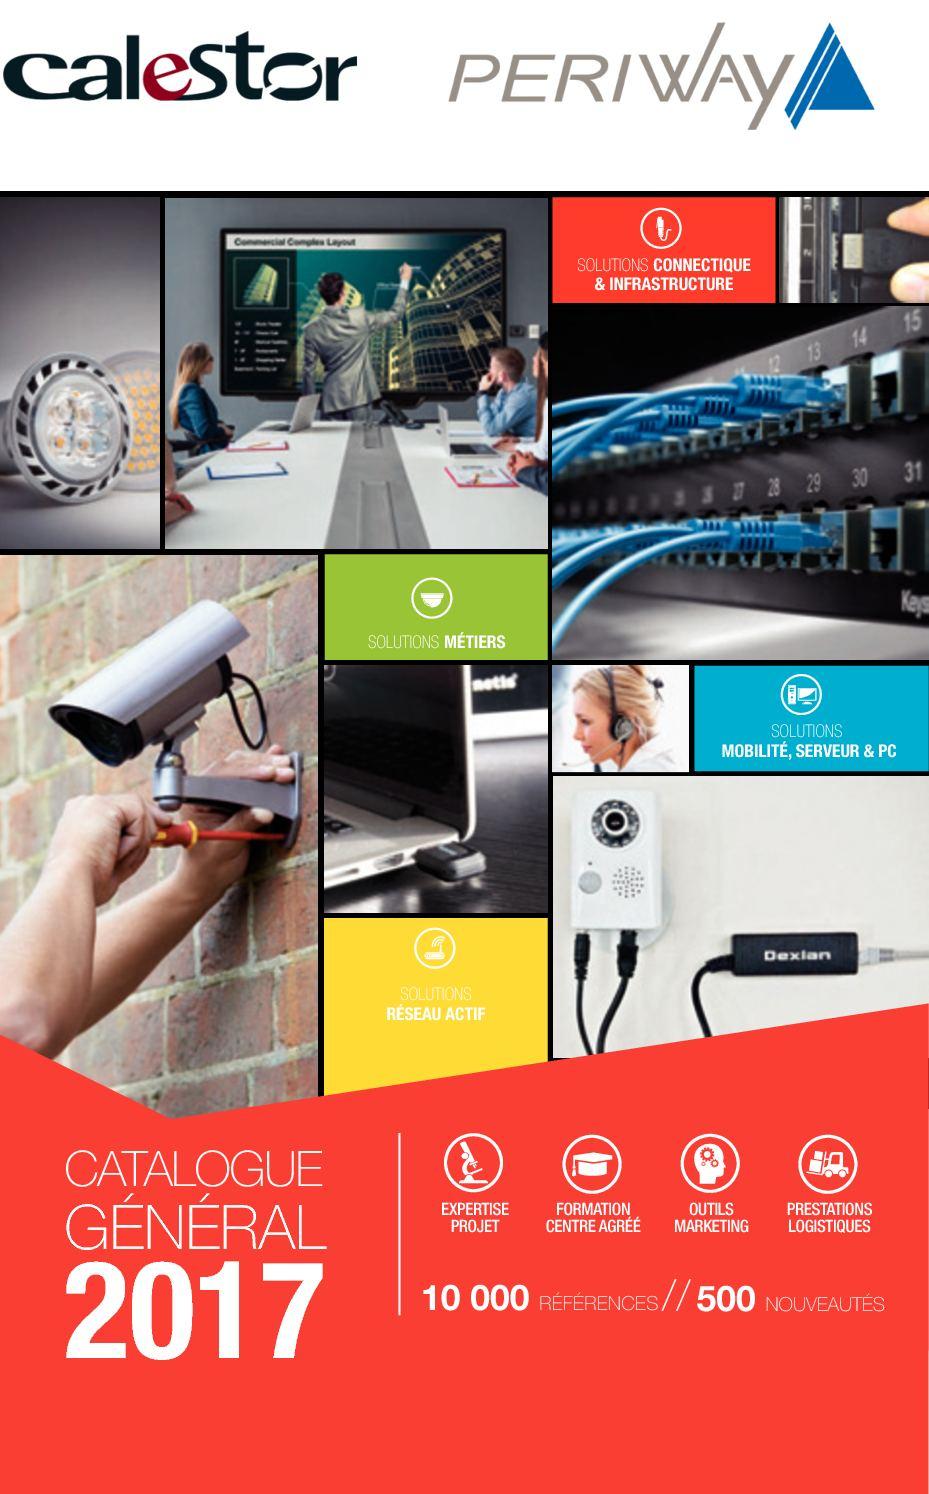 Catalogue Catalogue Calaméo Calestor Calestor 2017 Calaméo Periway Periway shrdtQ